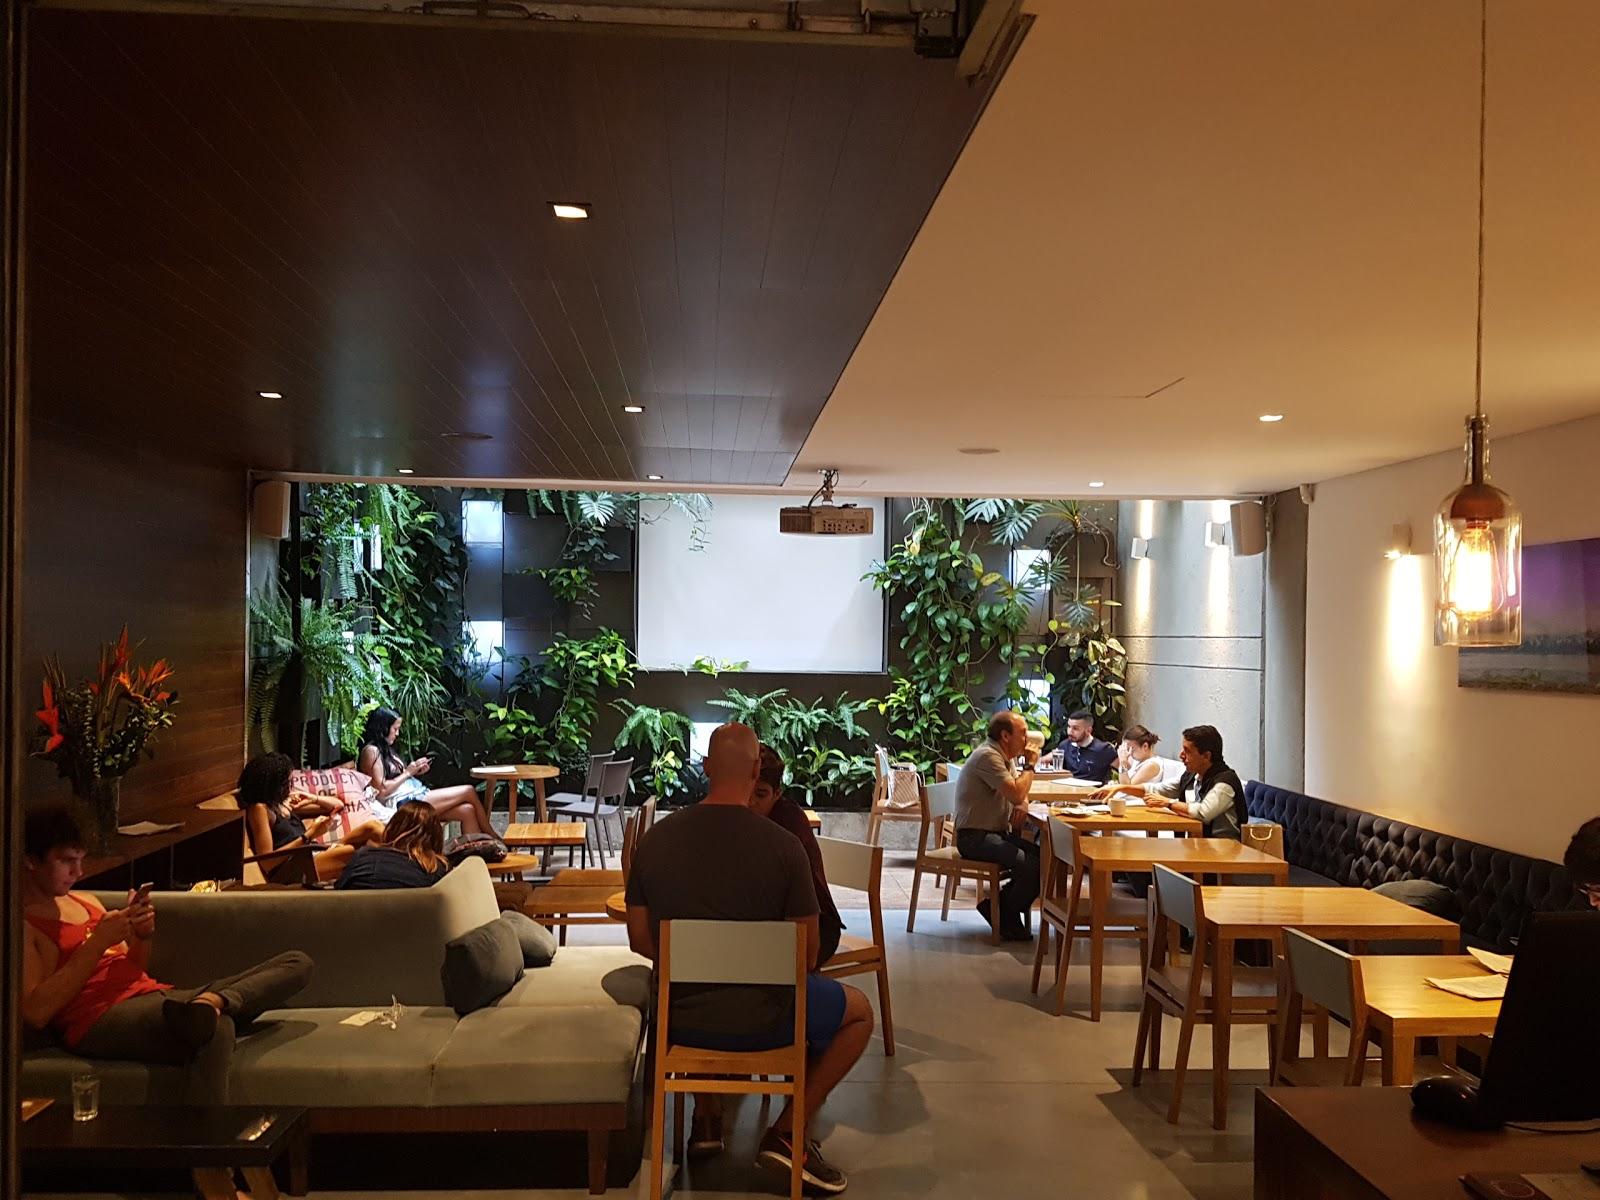 Cafe Velvet: A Work-Friendly Place in Medellin